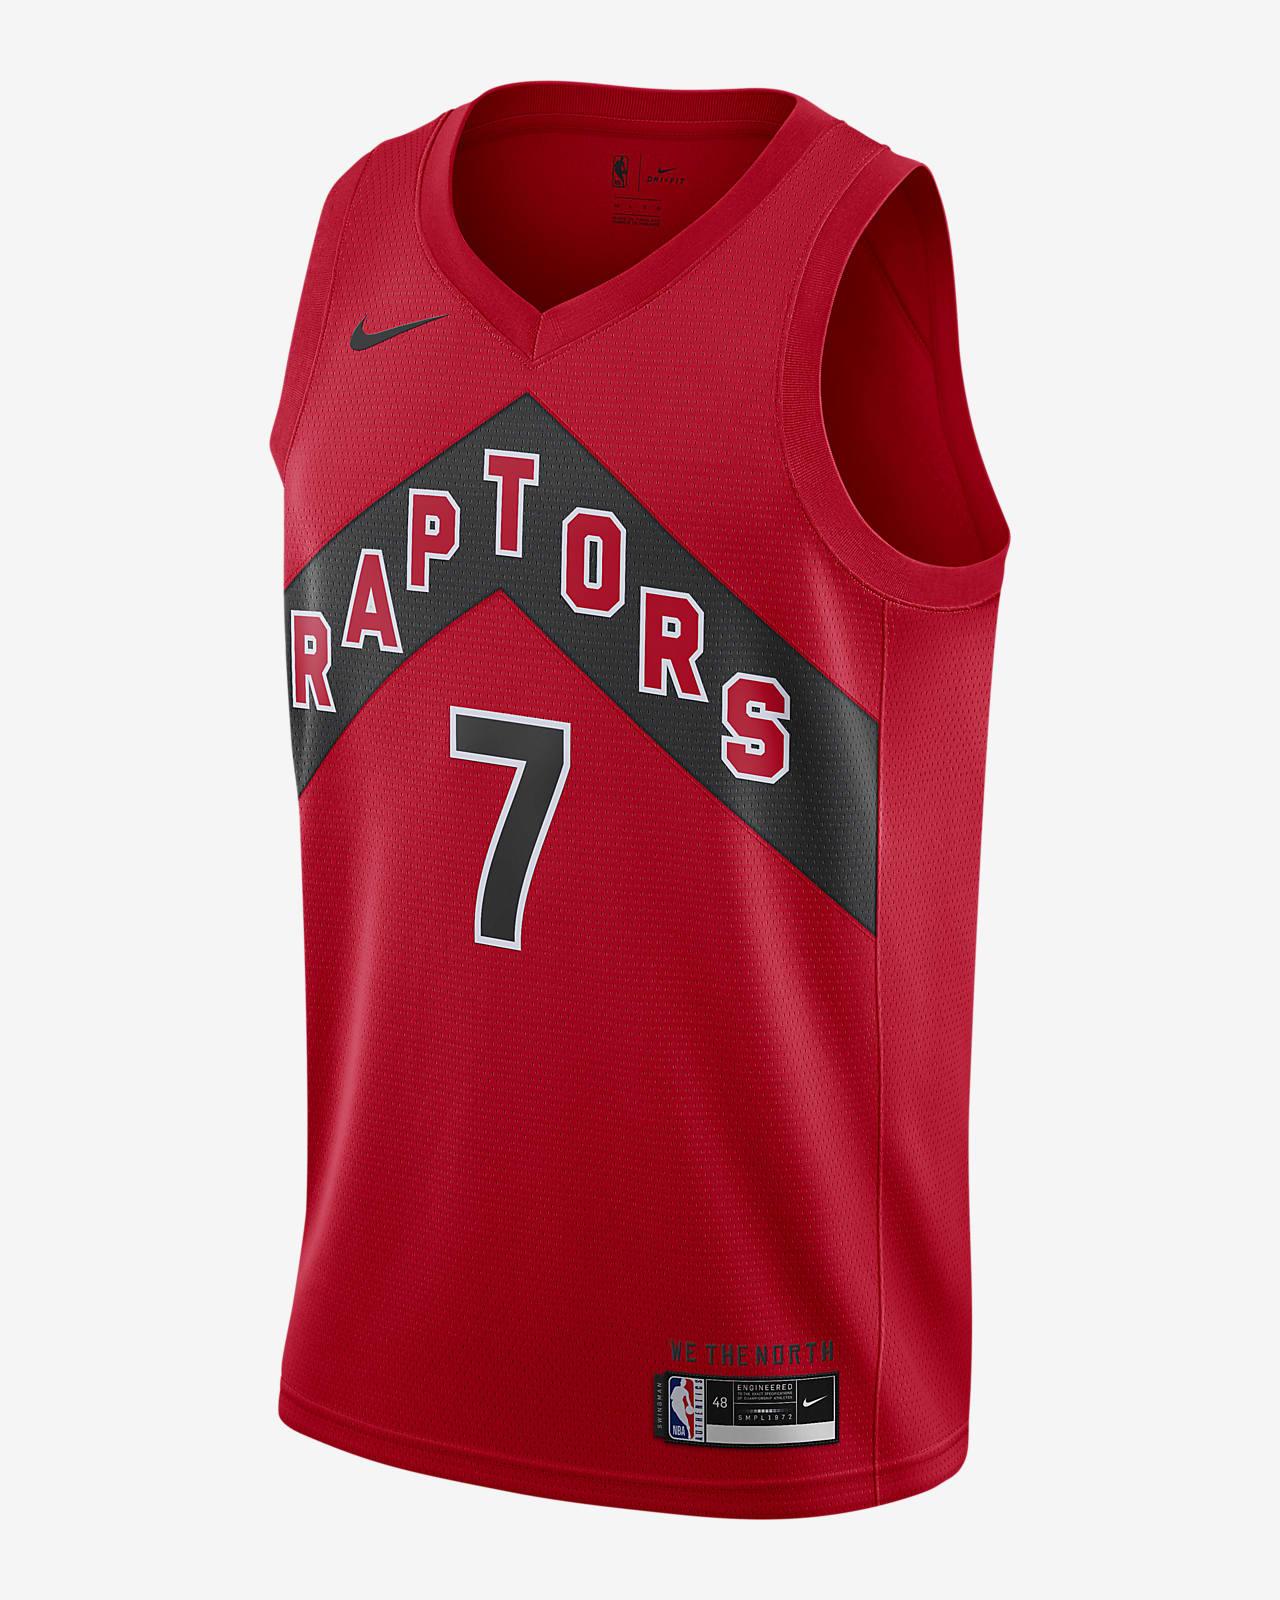 Maillot Nike NBA Swingman Kyle Lowry Raptors Icon Edition 2020